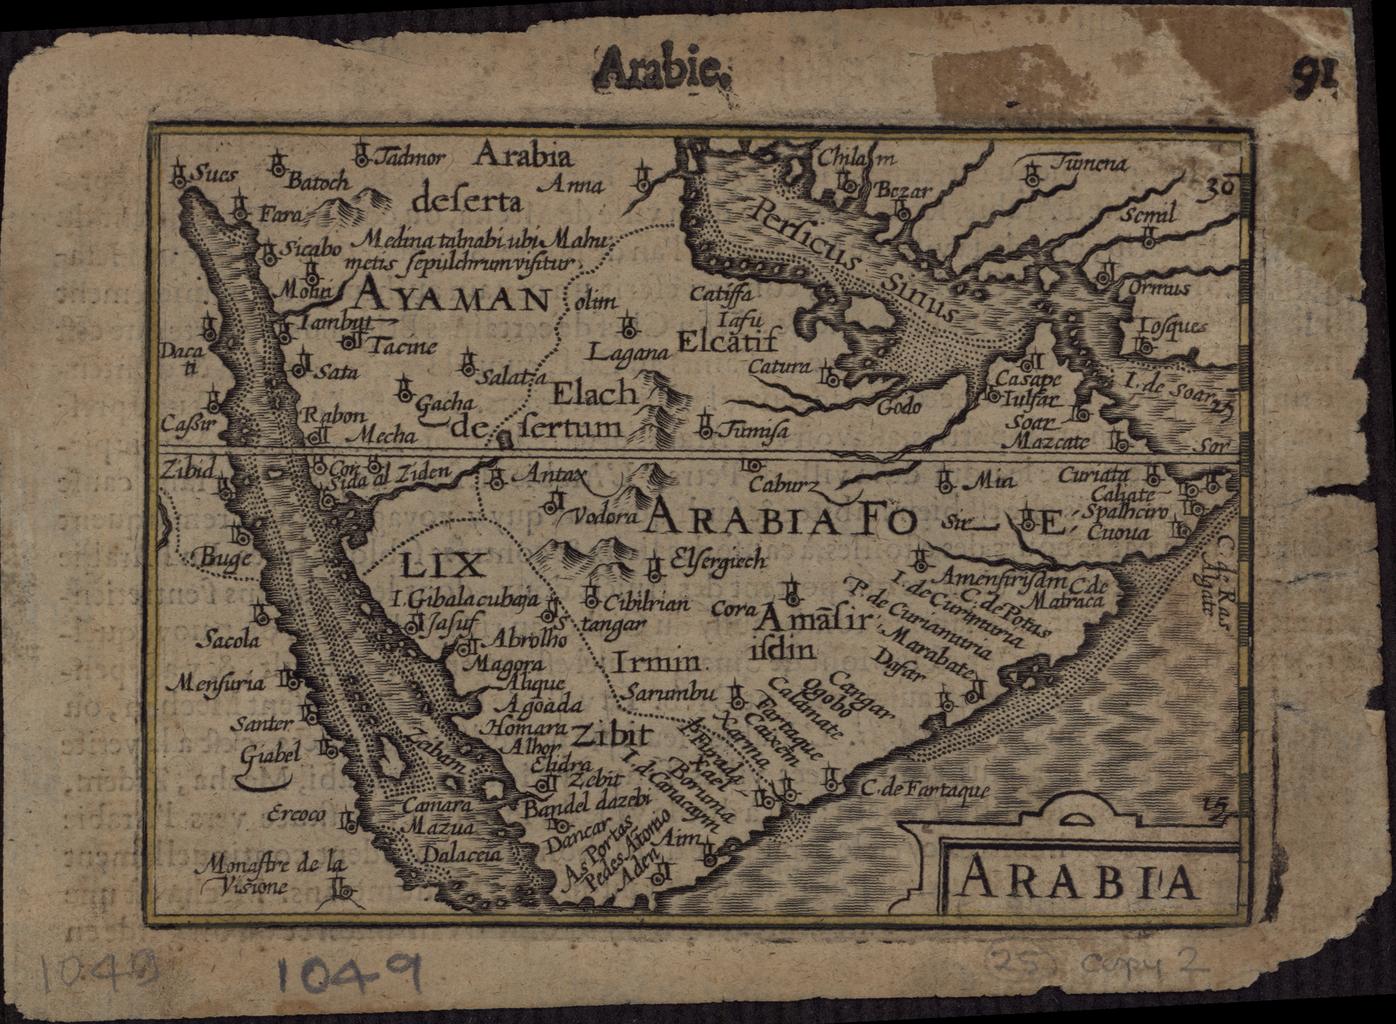 Vintage Maps of the Arabian Peninsula – Map of Arabia